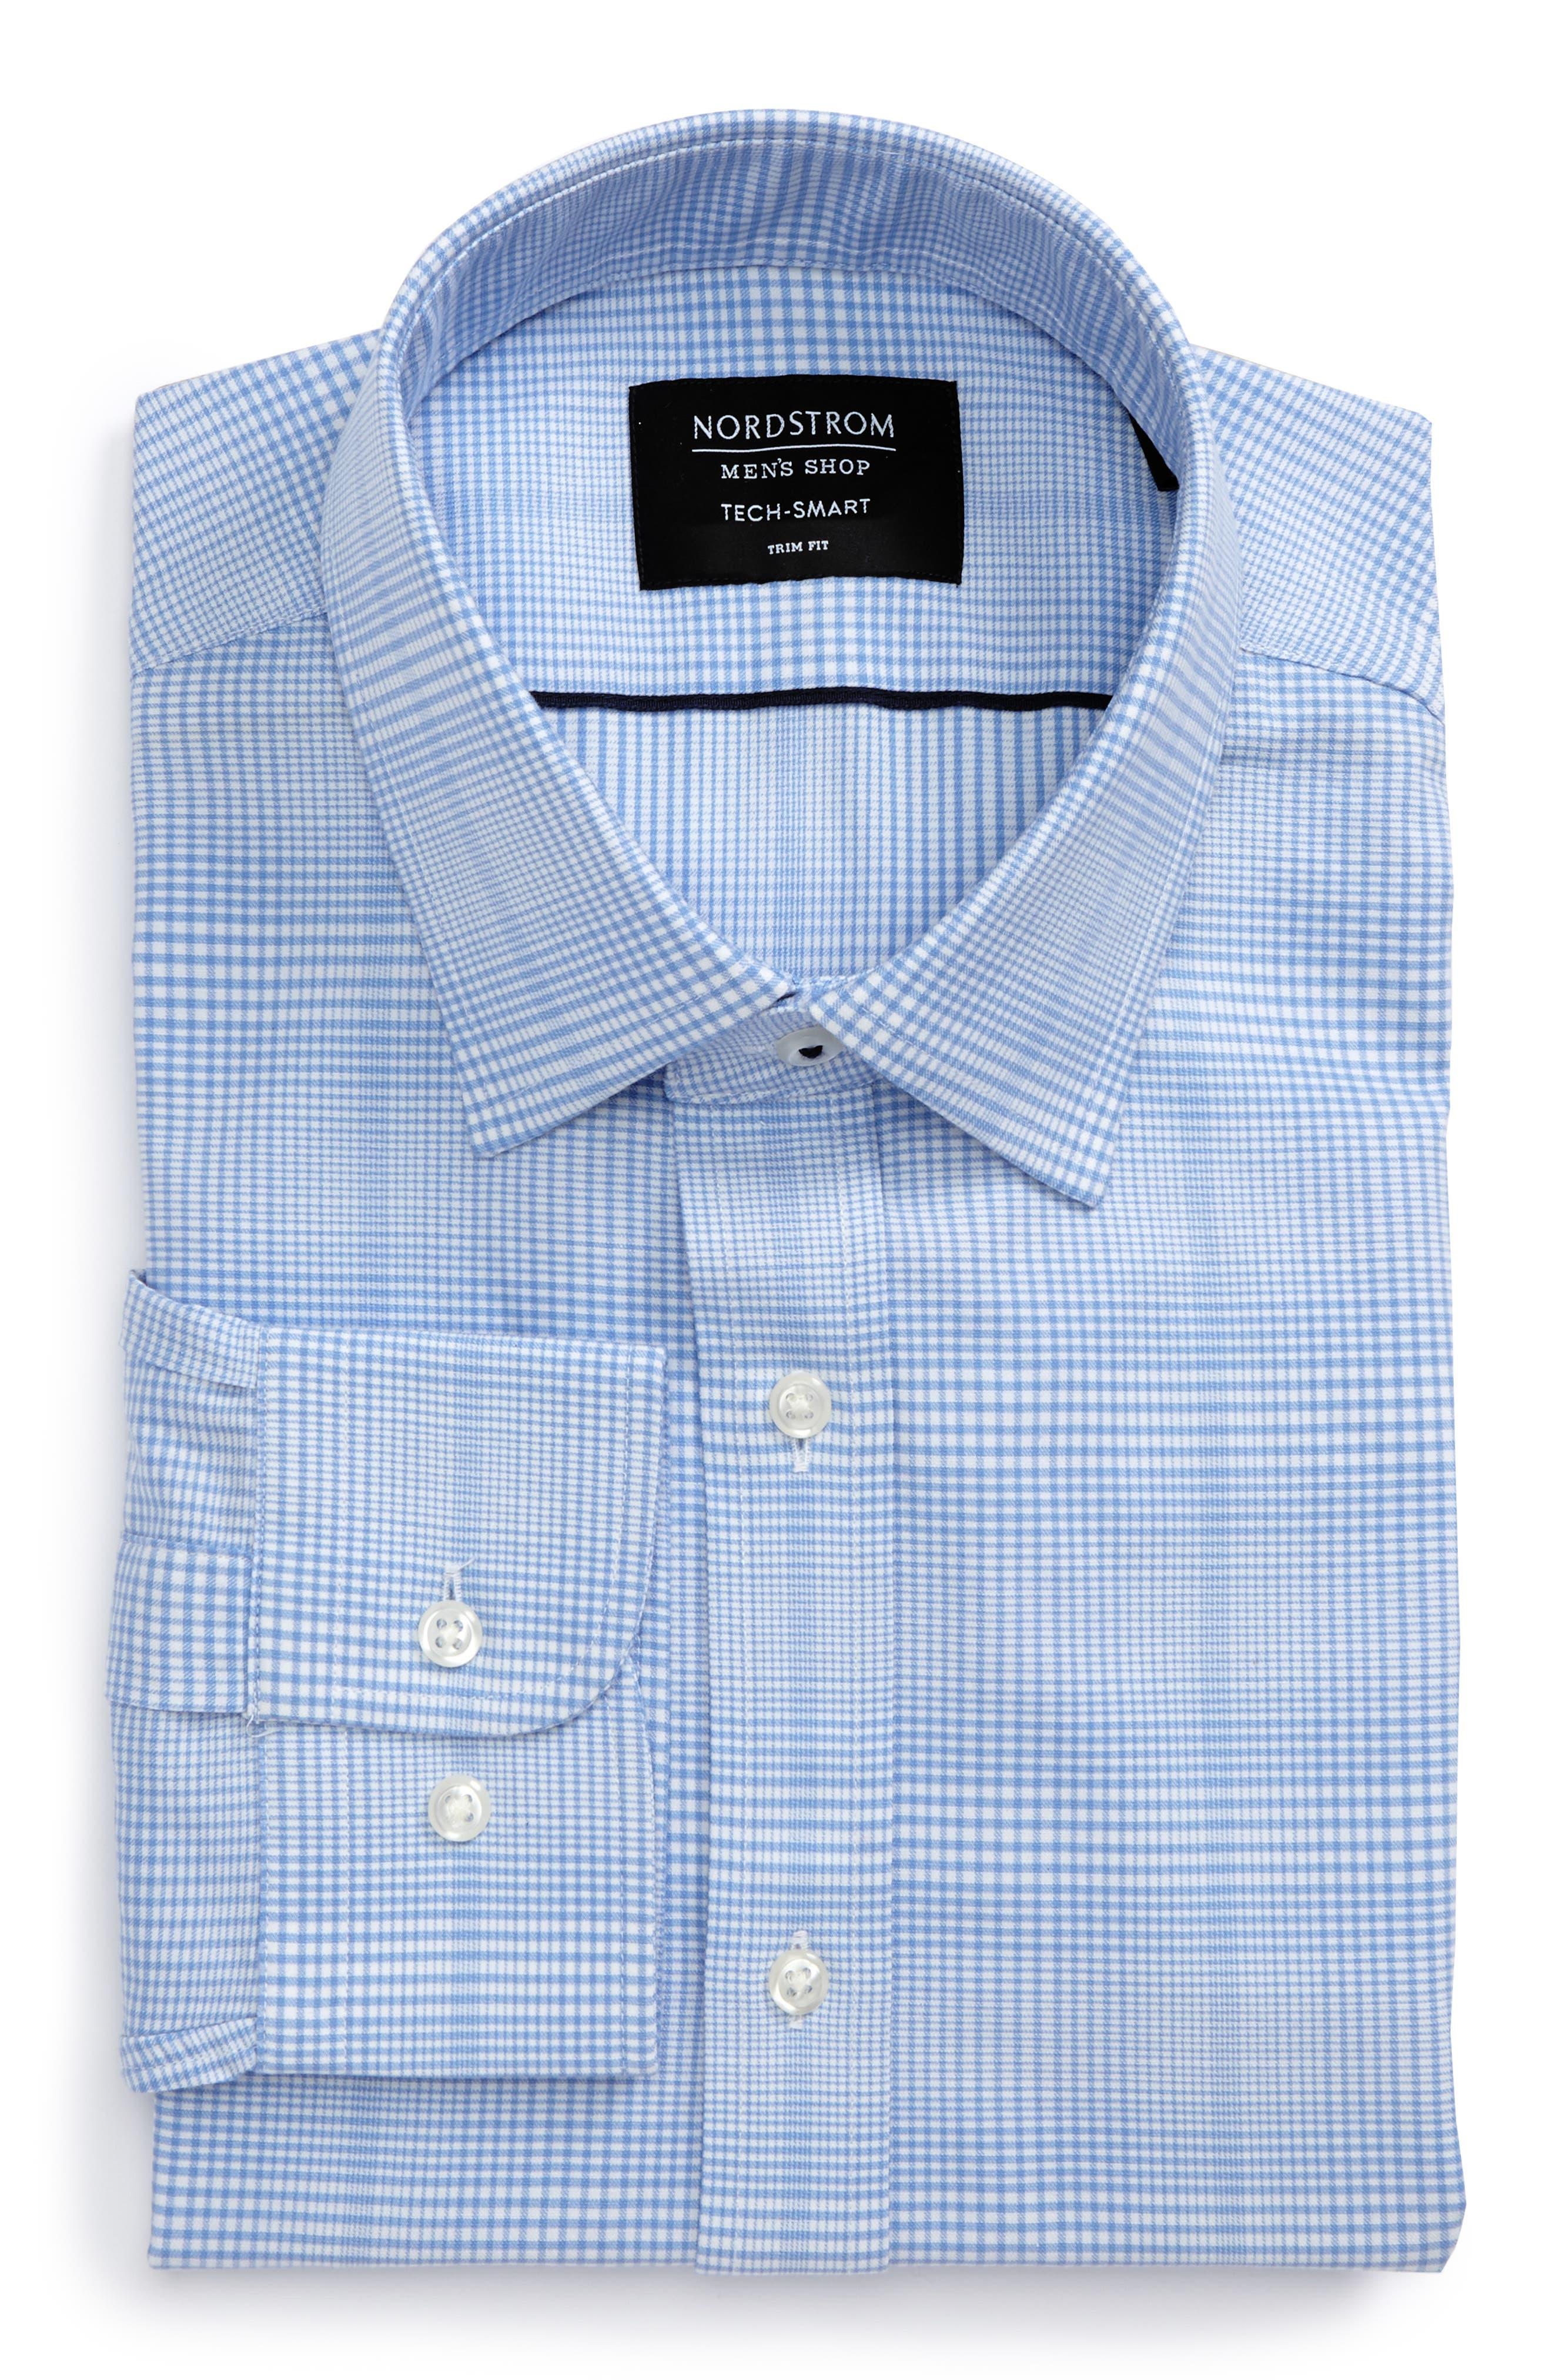 Alternate Image 1 Selected - Nordstrom Men's Shop Tech-Smart Trim Fit Check Dress Shirt